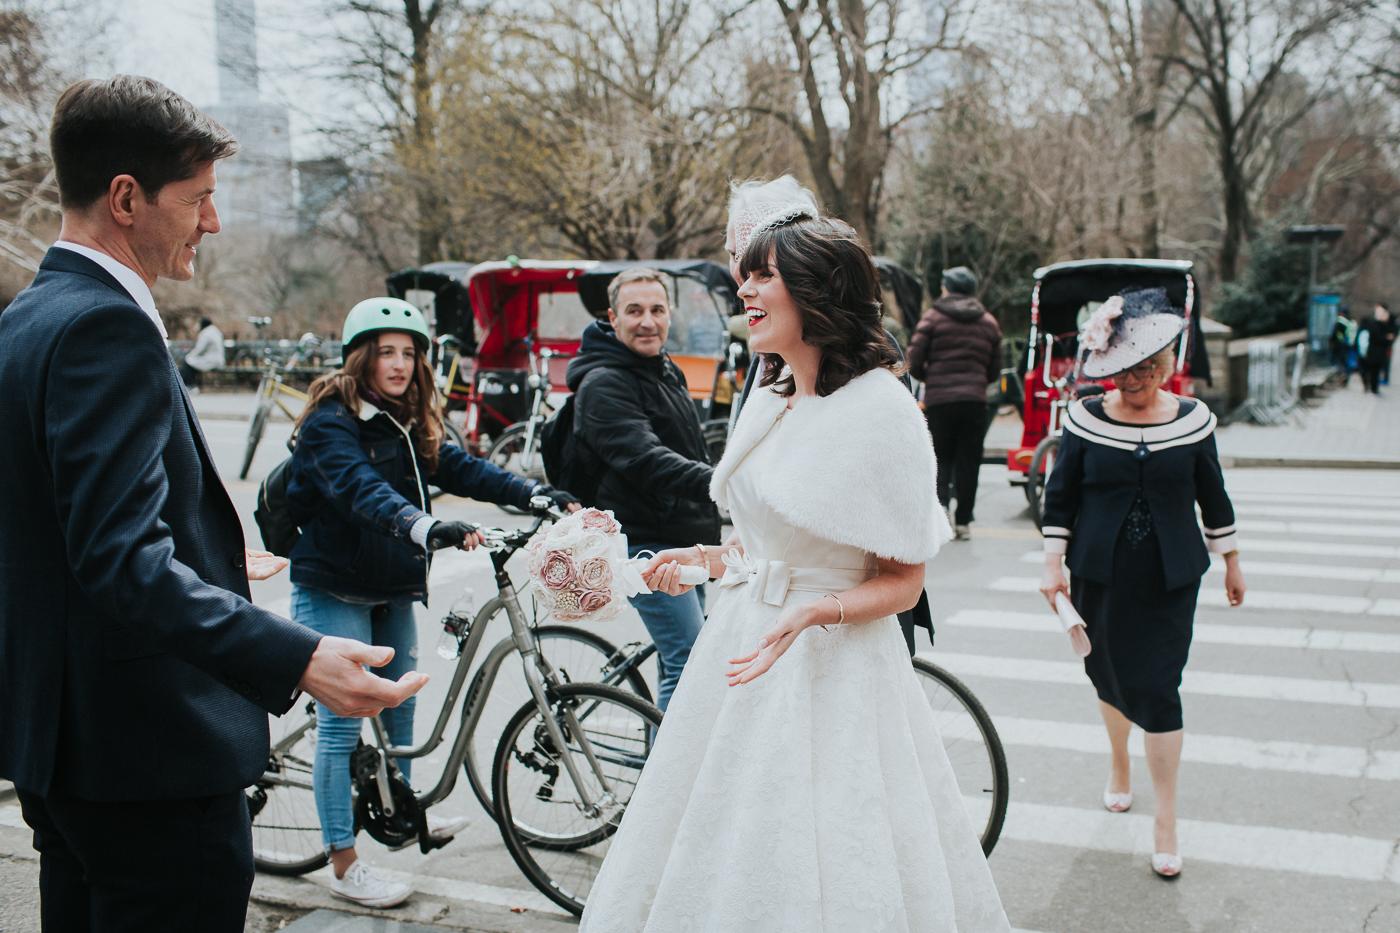 Ladies-Pavilion-Central-Park-NYC-Documentary-Elopement-Wedding-Photographer-10.jpg